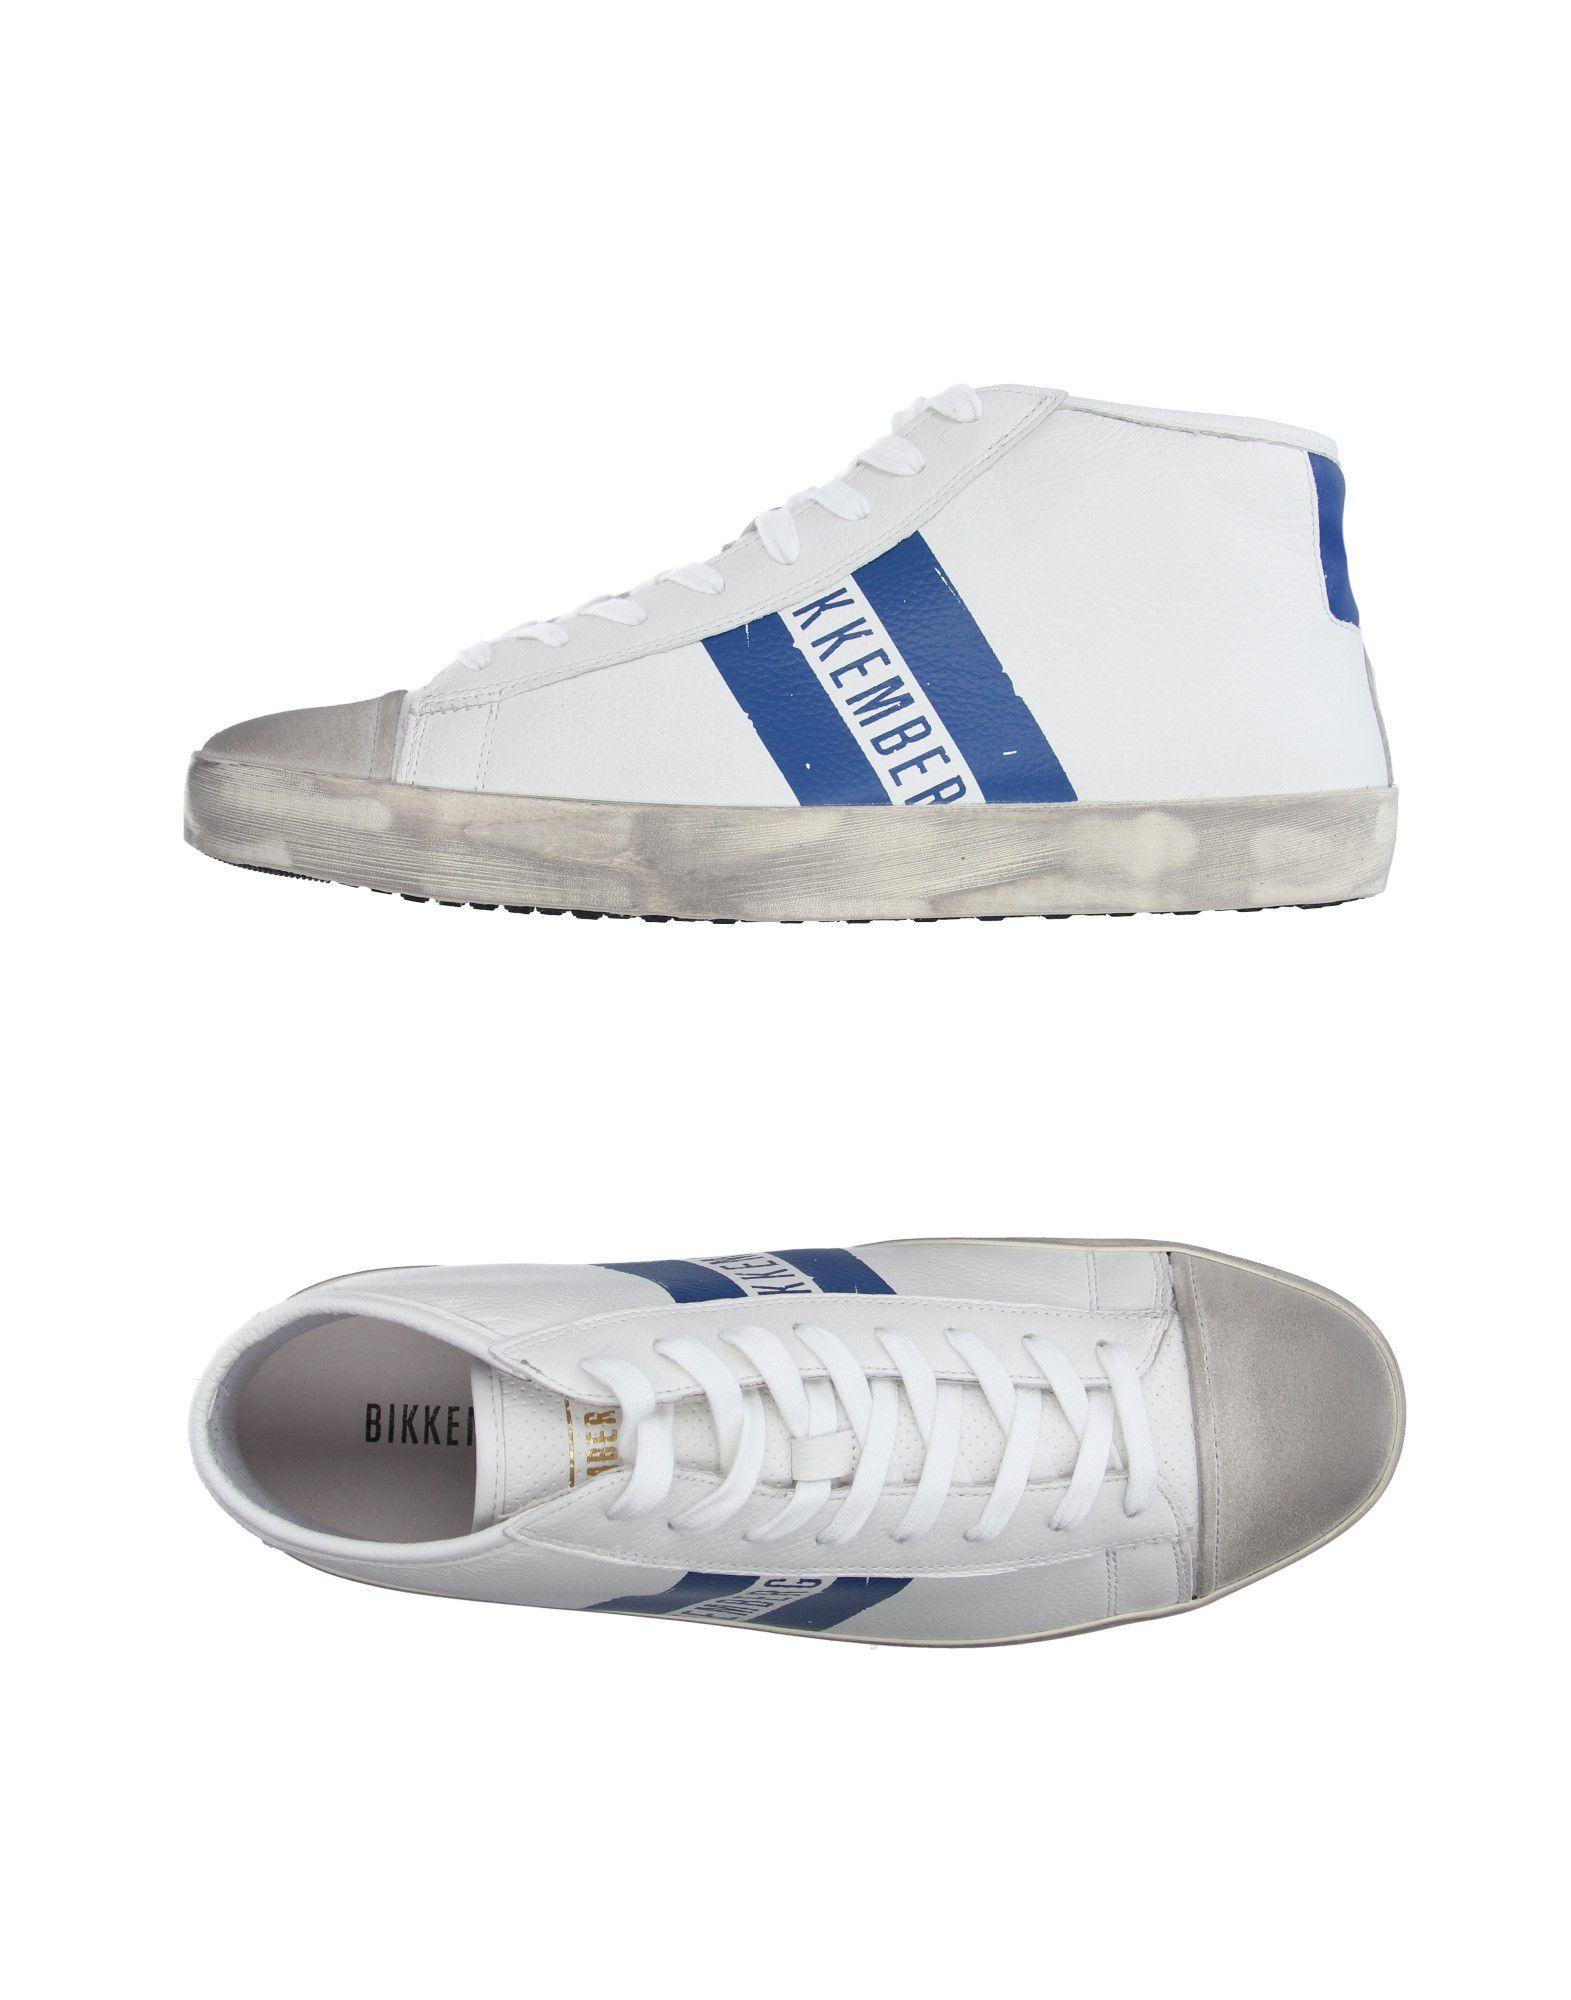 11142873RW Bikkembergs Sneakers Herren  11142873RW  Heiße Schuhe c8bbe3